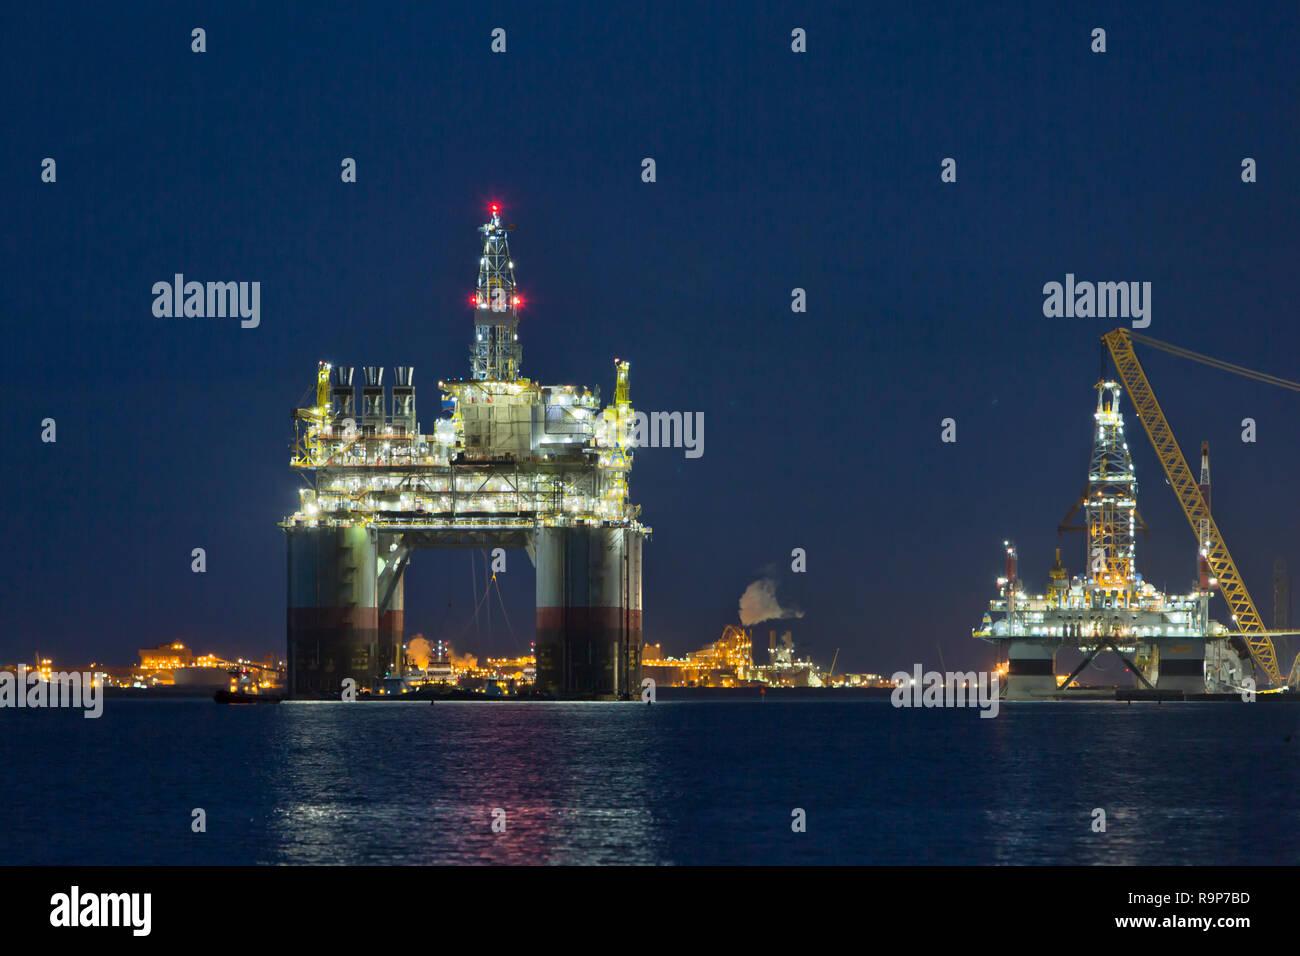 'Big Foot'  Chevron's Deep Ocean Platform, Kiewit Offshore, departing Ingleside Bay. - Stock Image